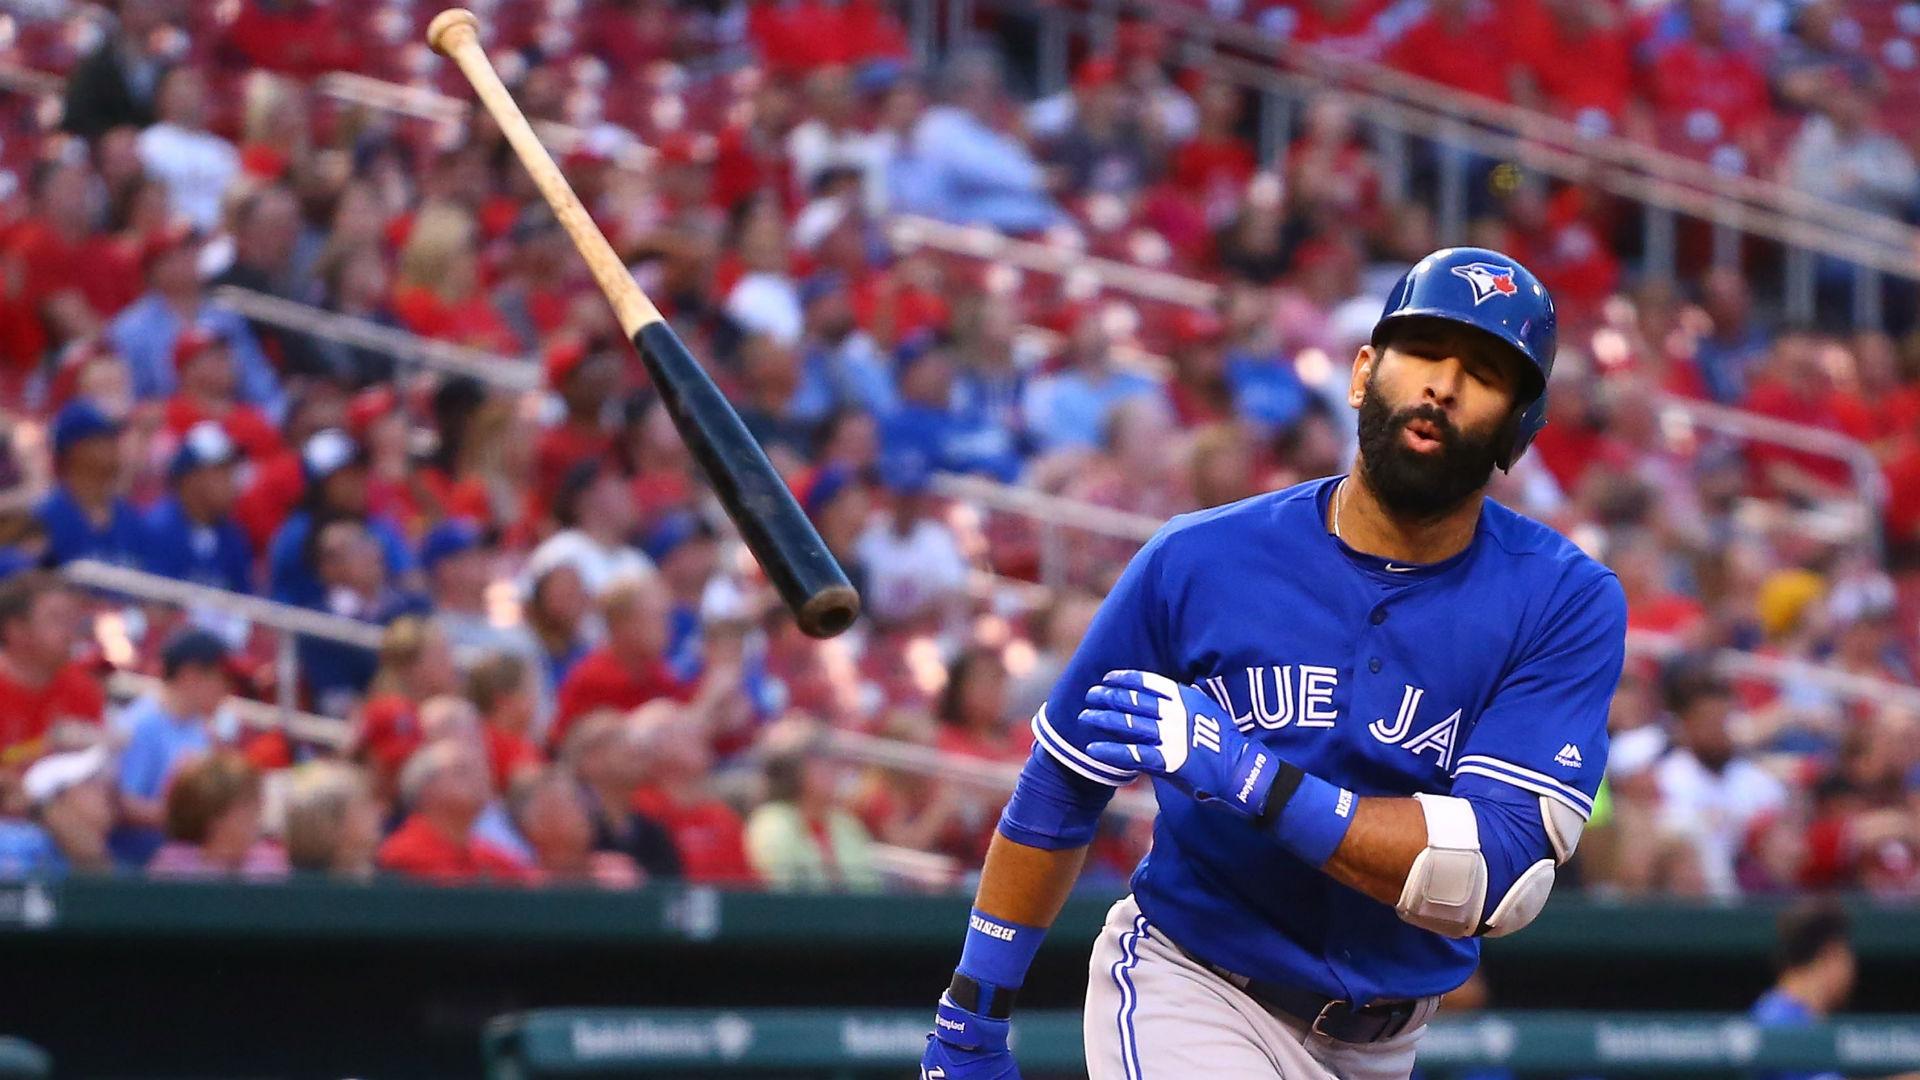 39deb5f67 Jose Bautista's bat flip is the dumbest thing in baseball this week |  Sporting News